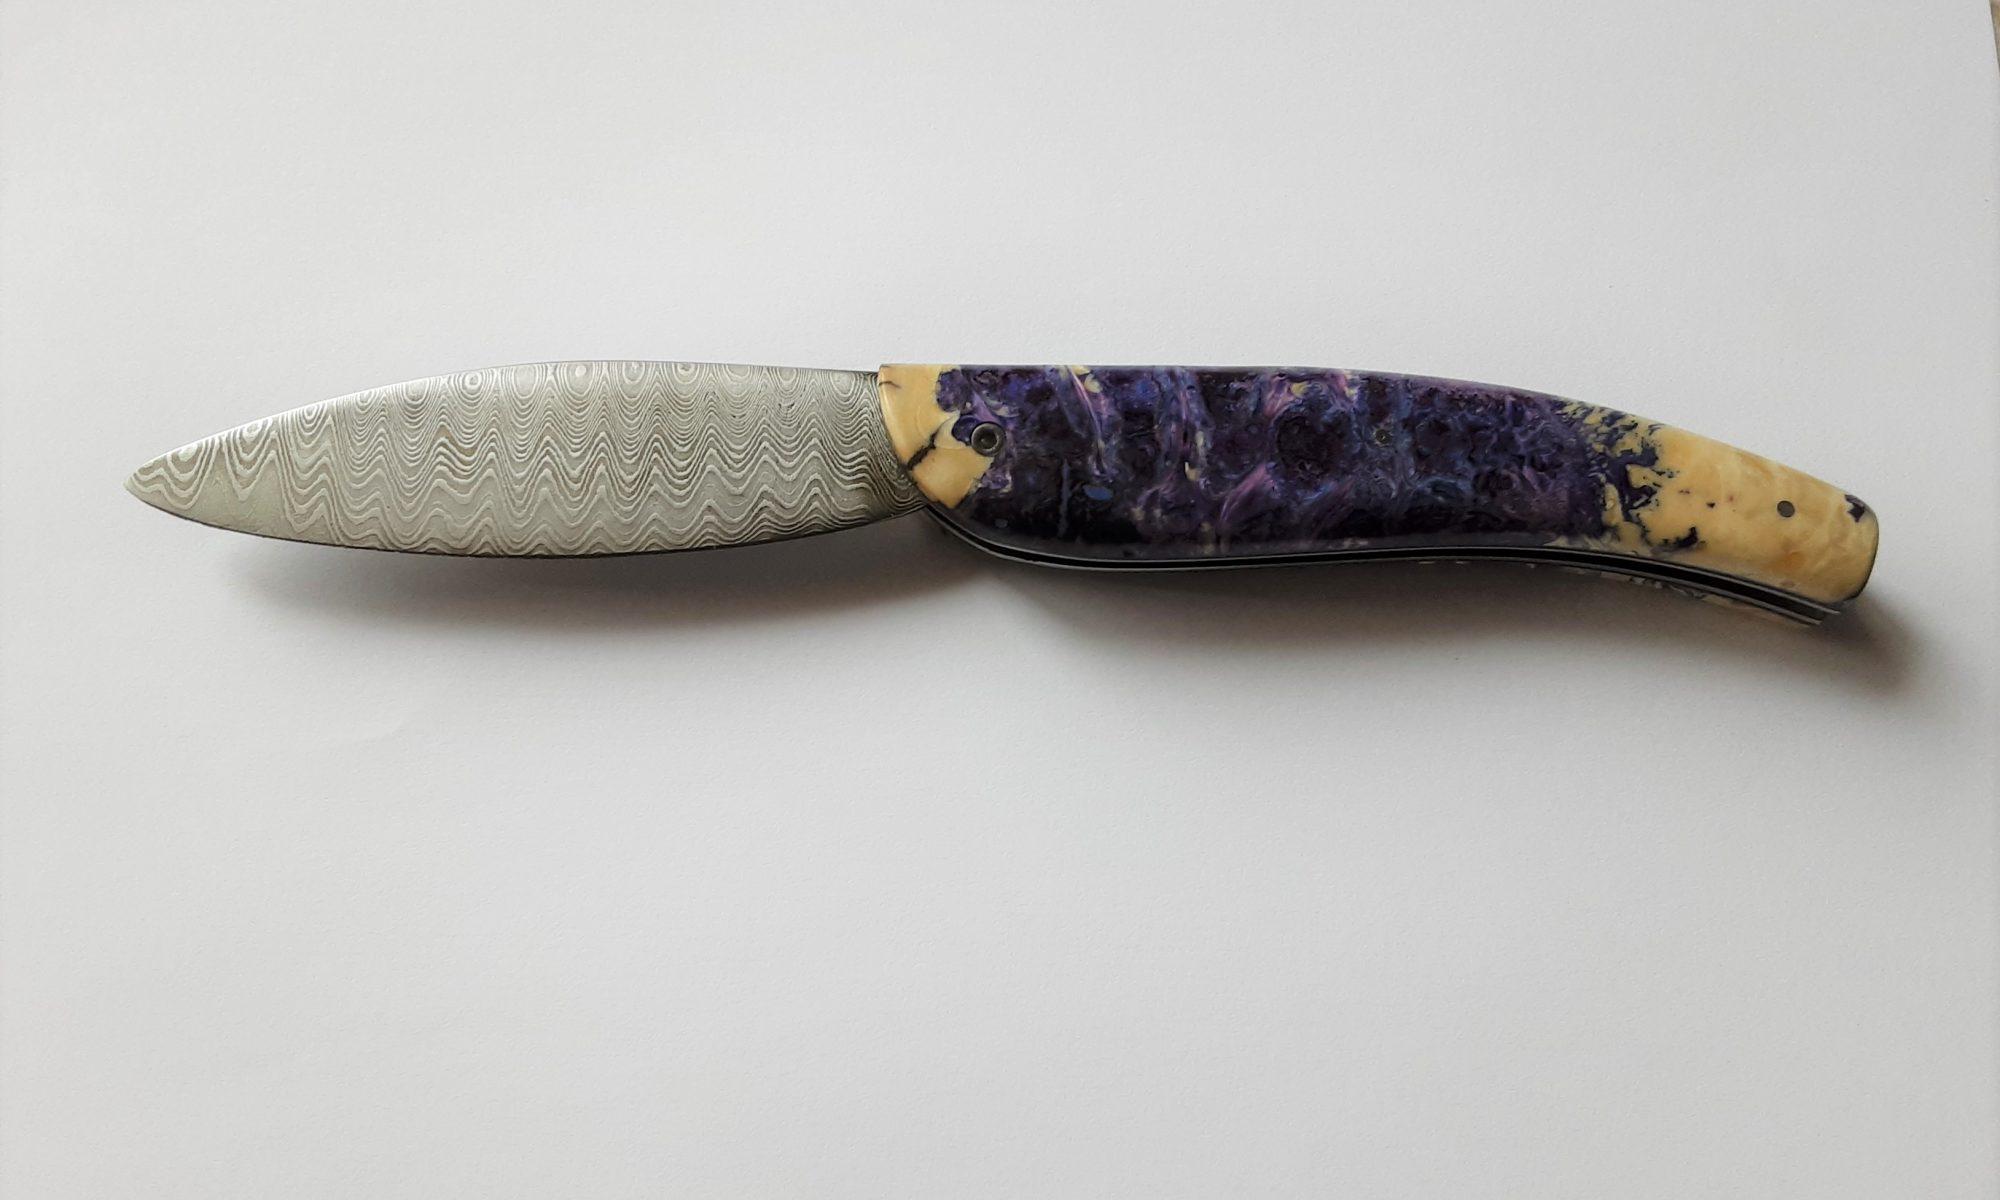 20-16 Molaire violette